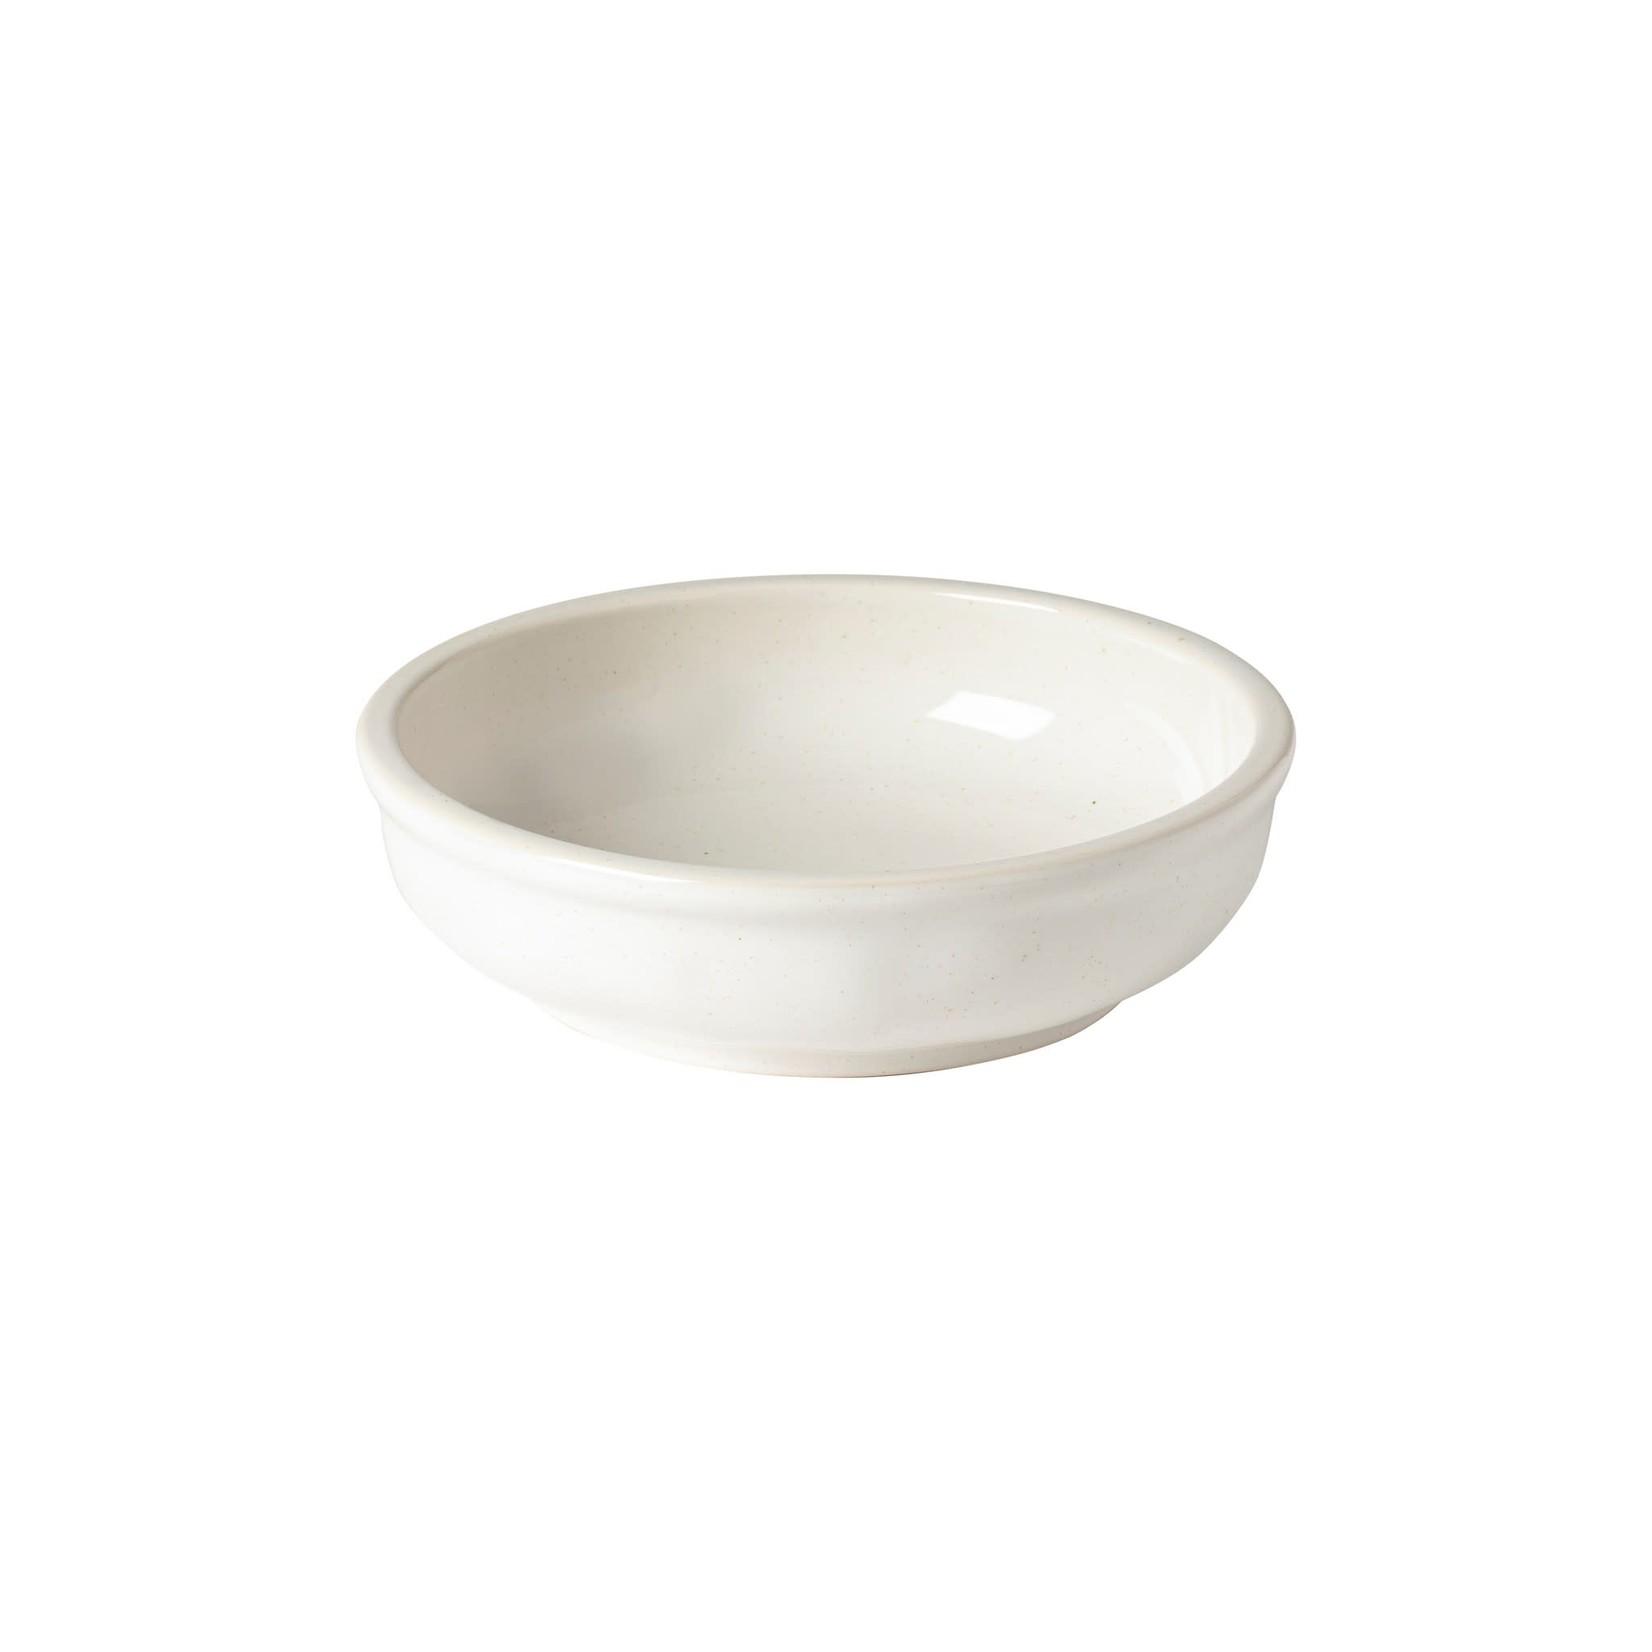 Fattoria White Soup/pasta bowl